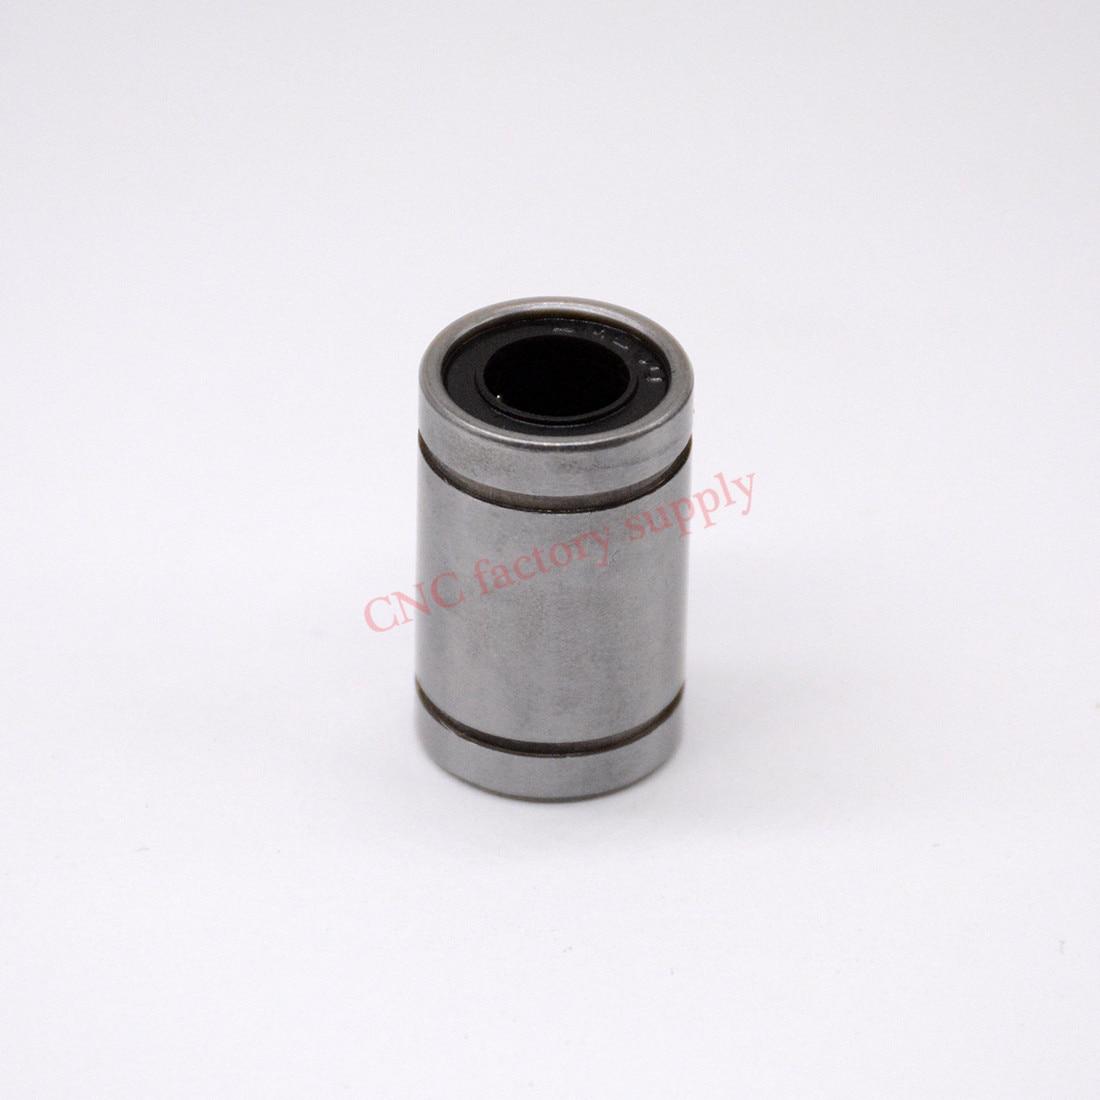 4pcs/lot Free shipping LM12UU Linear Bushing 12mm CNC Linear Bearings hot sale 1pc lm12uu linear bushing 12mm cnc linear bearings